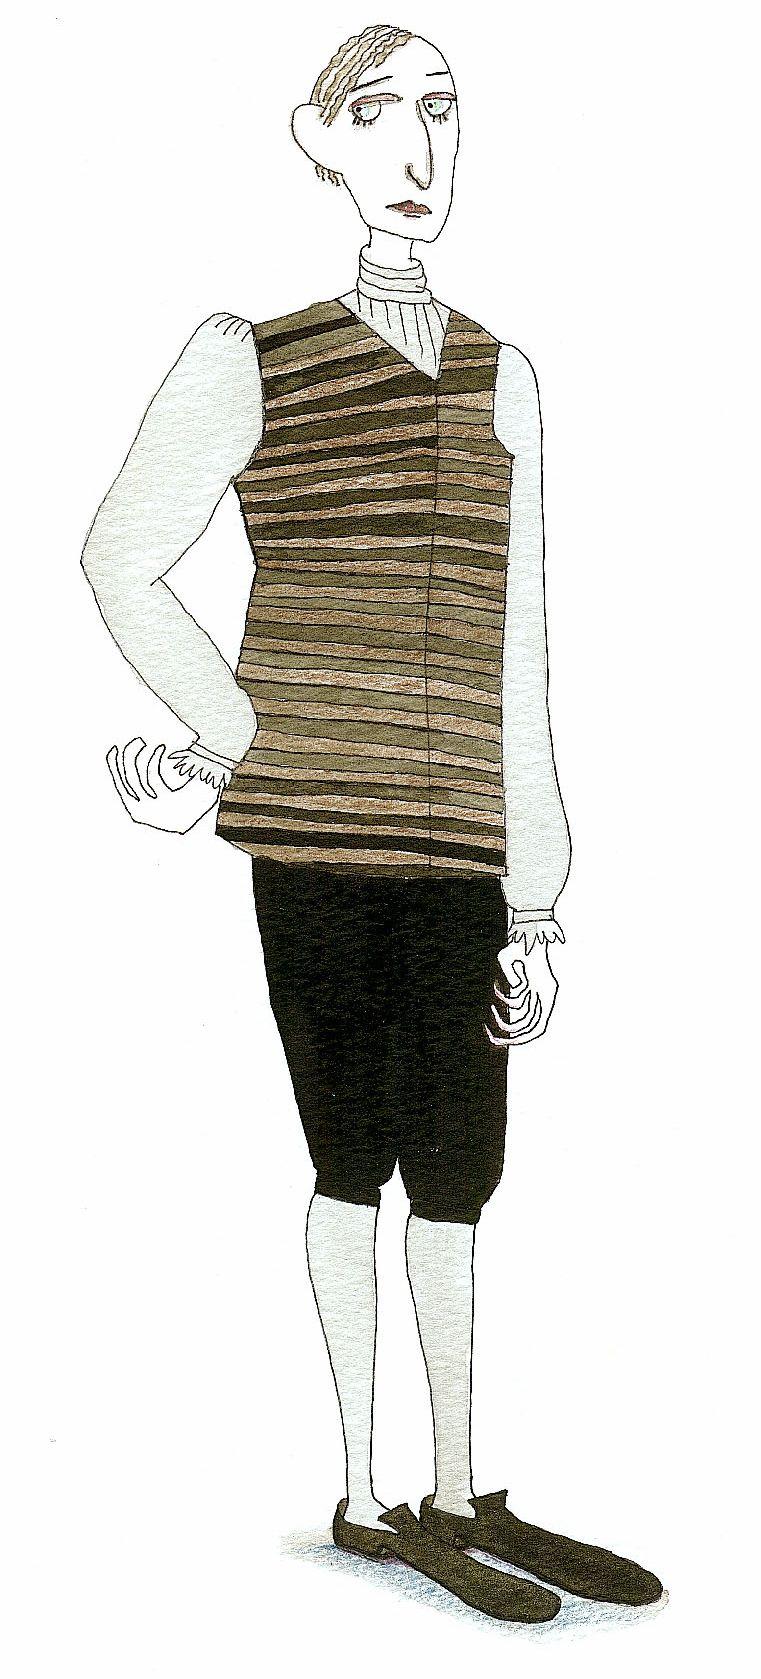 Venticelli, Amadeus, Uppsala Stadsteater 2002